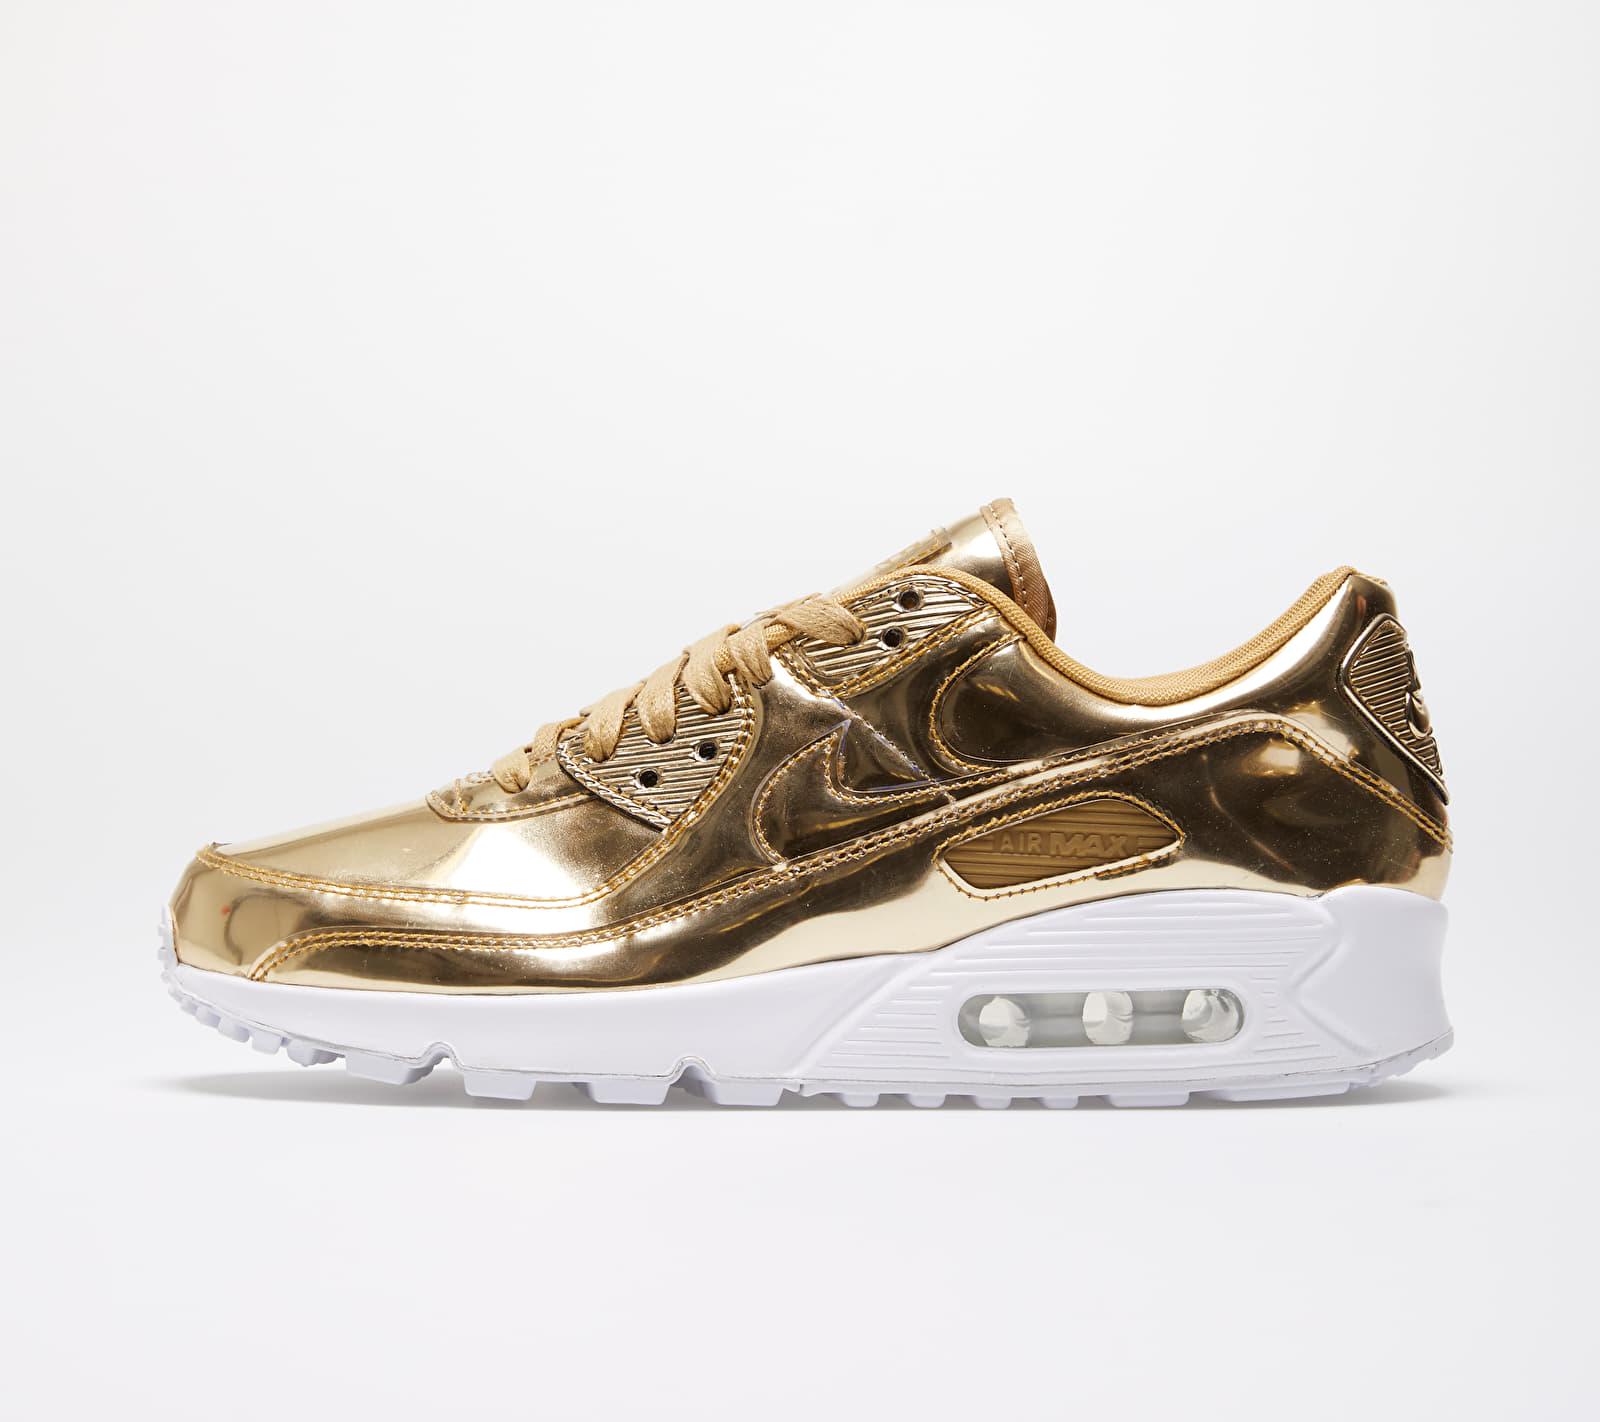 Nike W Air Max 90 SP Metallic Gold/ Metallic Gold-Club Gold 1